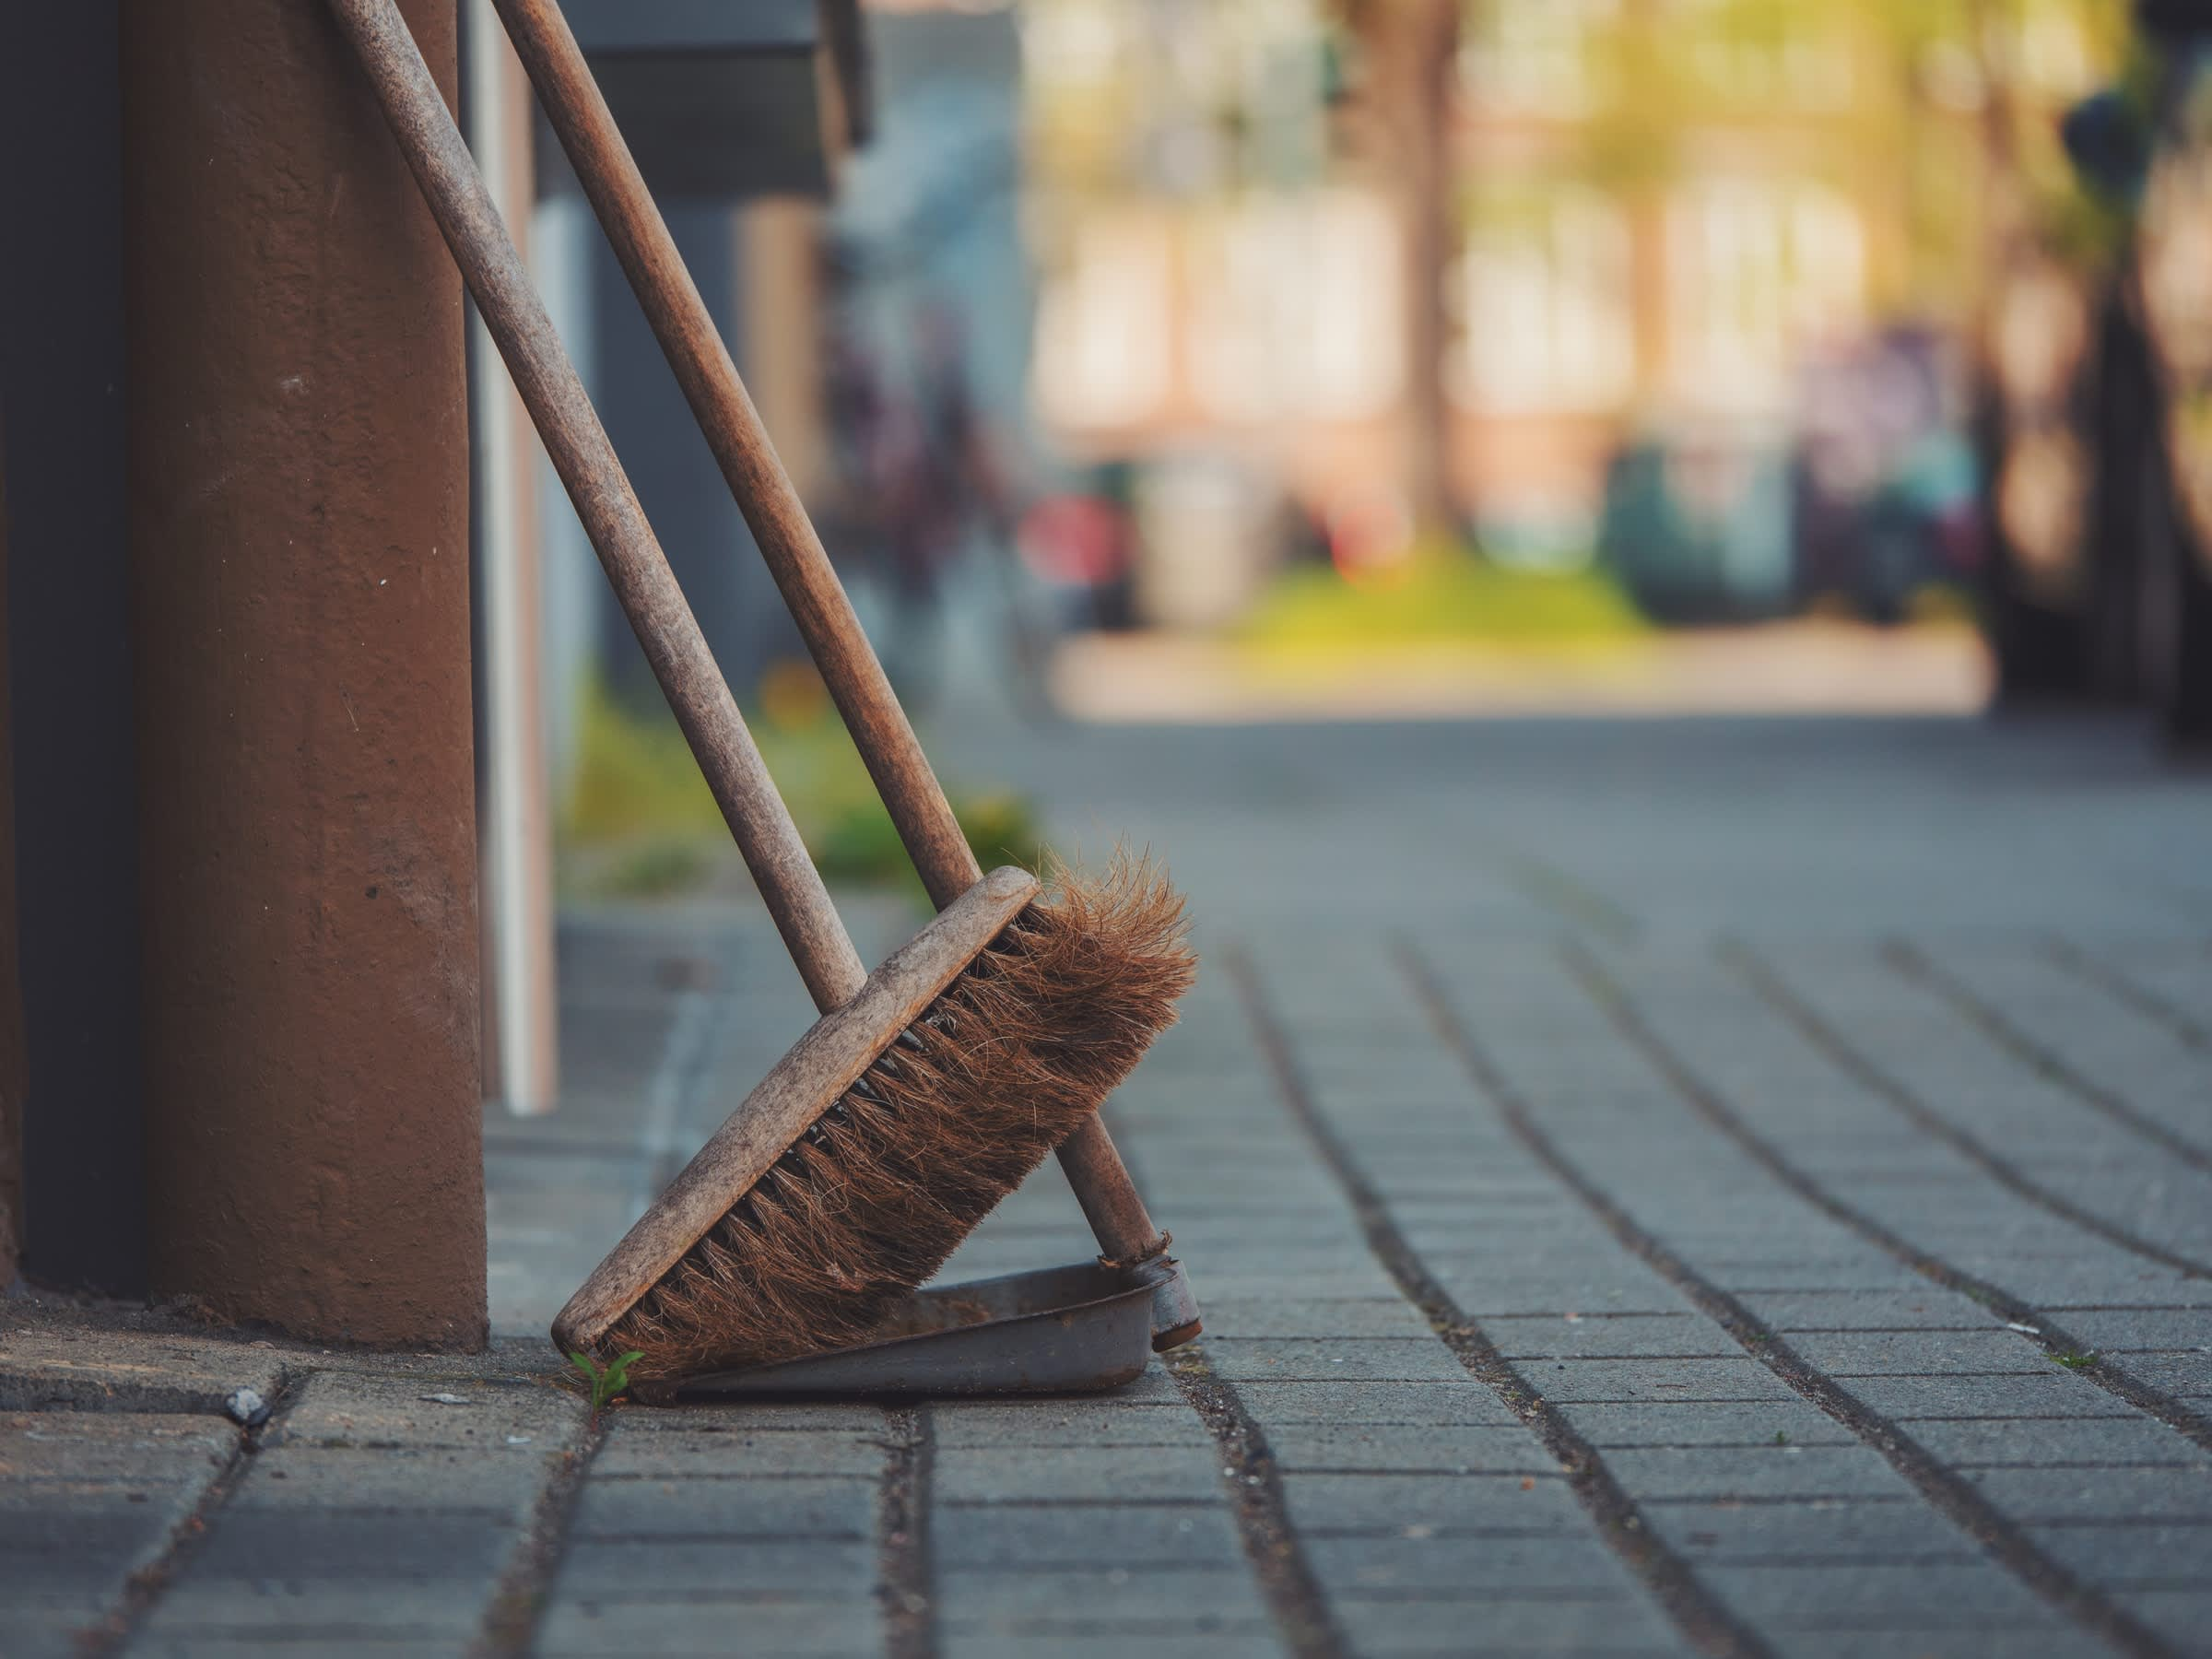 Broom and Dust Pan by Daniel von Appen